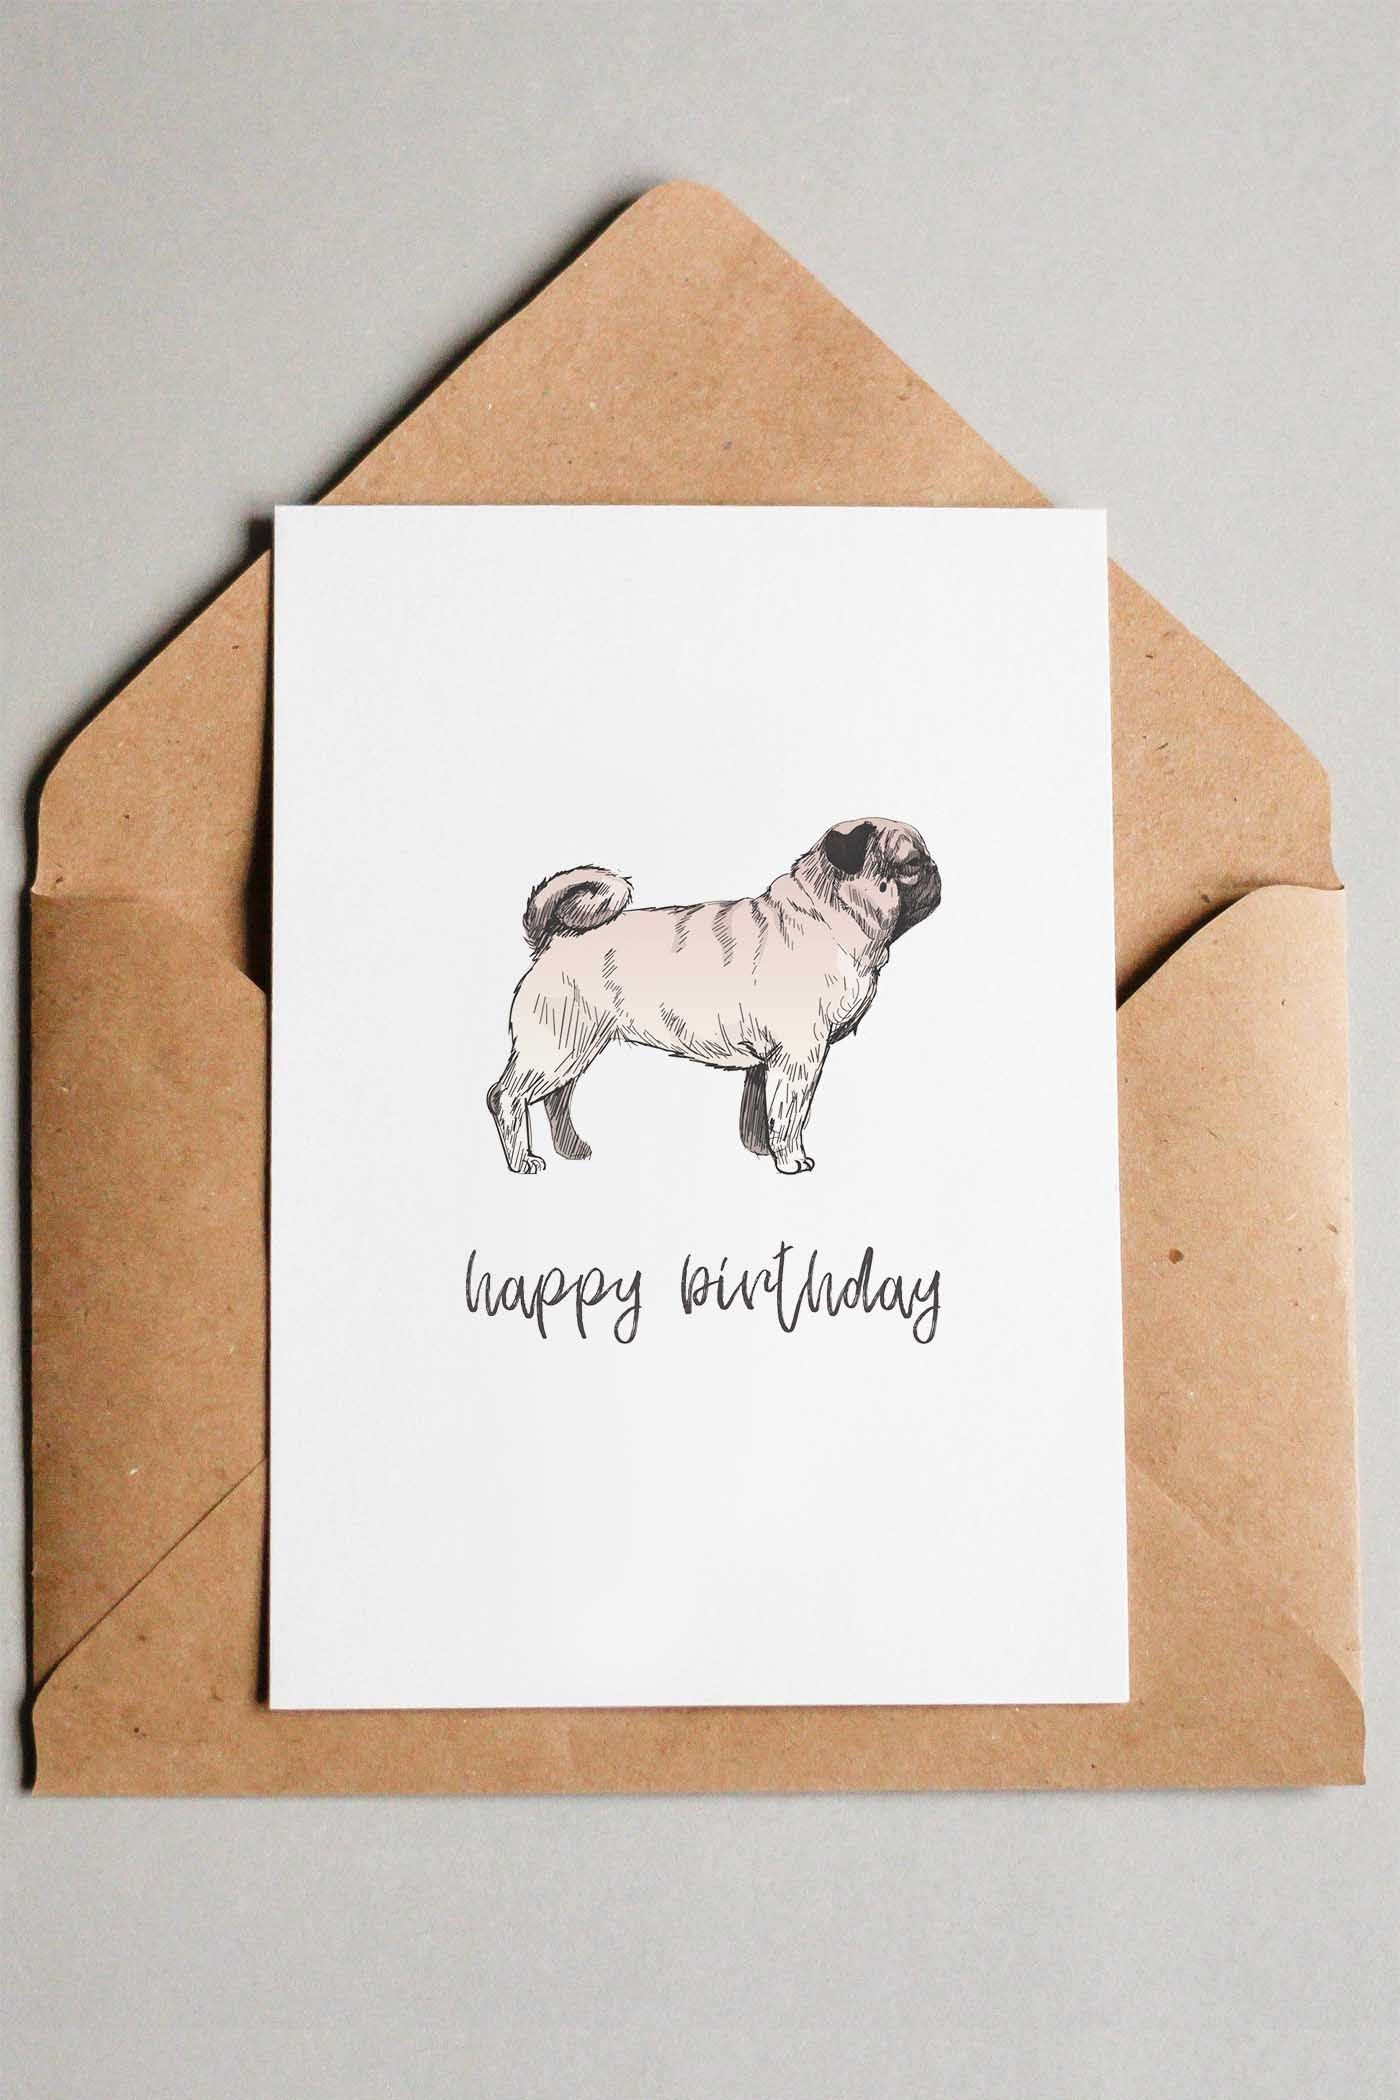 22 Free Printable Dog Birthday Cards | C A R D S | Free Printable - Free Printable Pug Birthday Cards